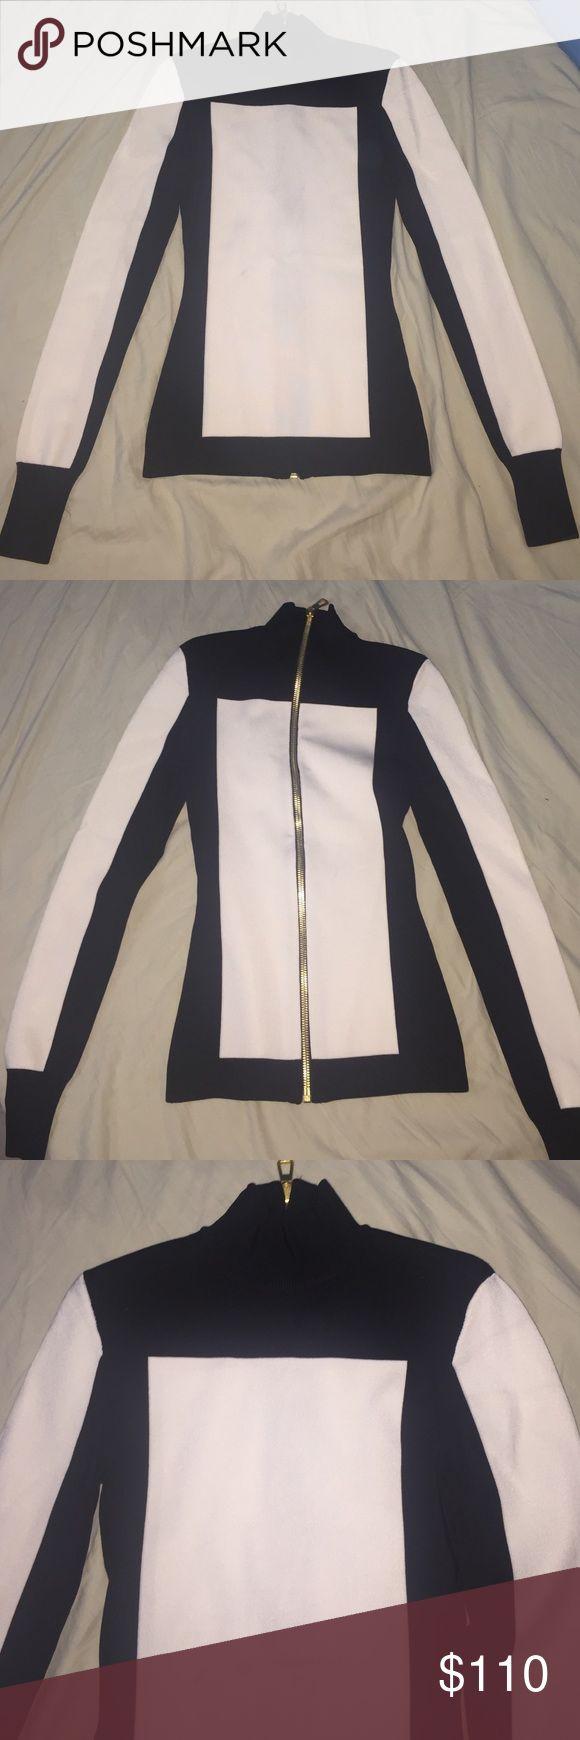 Sweater Balmain- limited edition turtleneck sweater with shoulder pads Balmain Sweaters Cowl & Turtlenecks